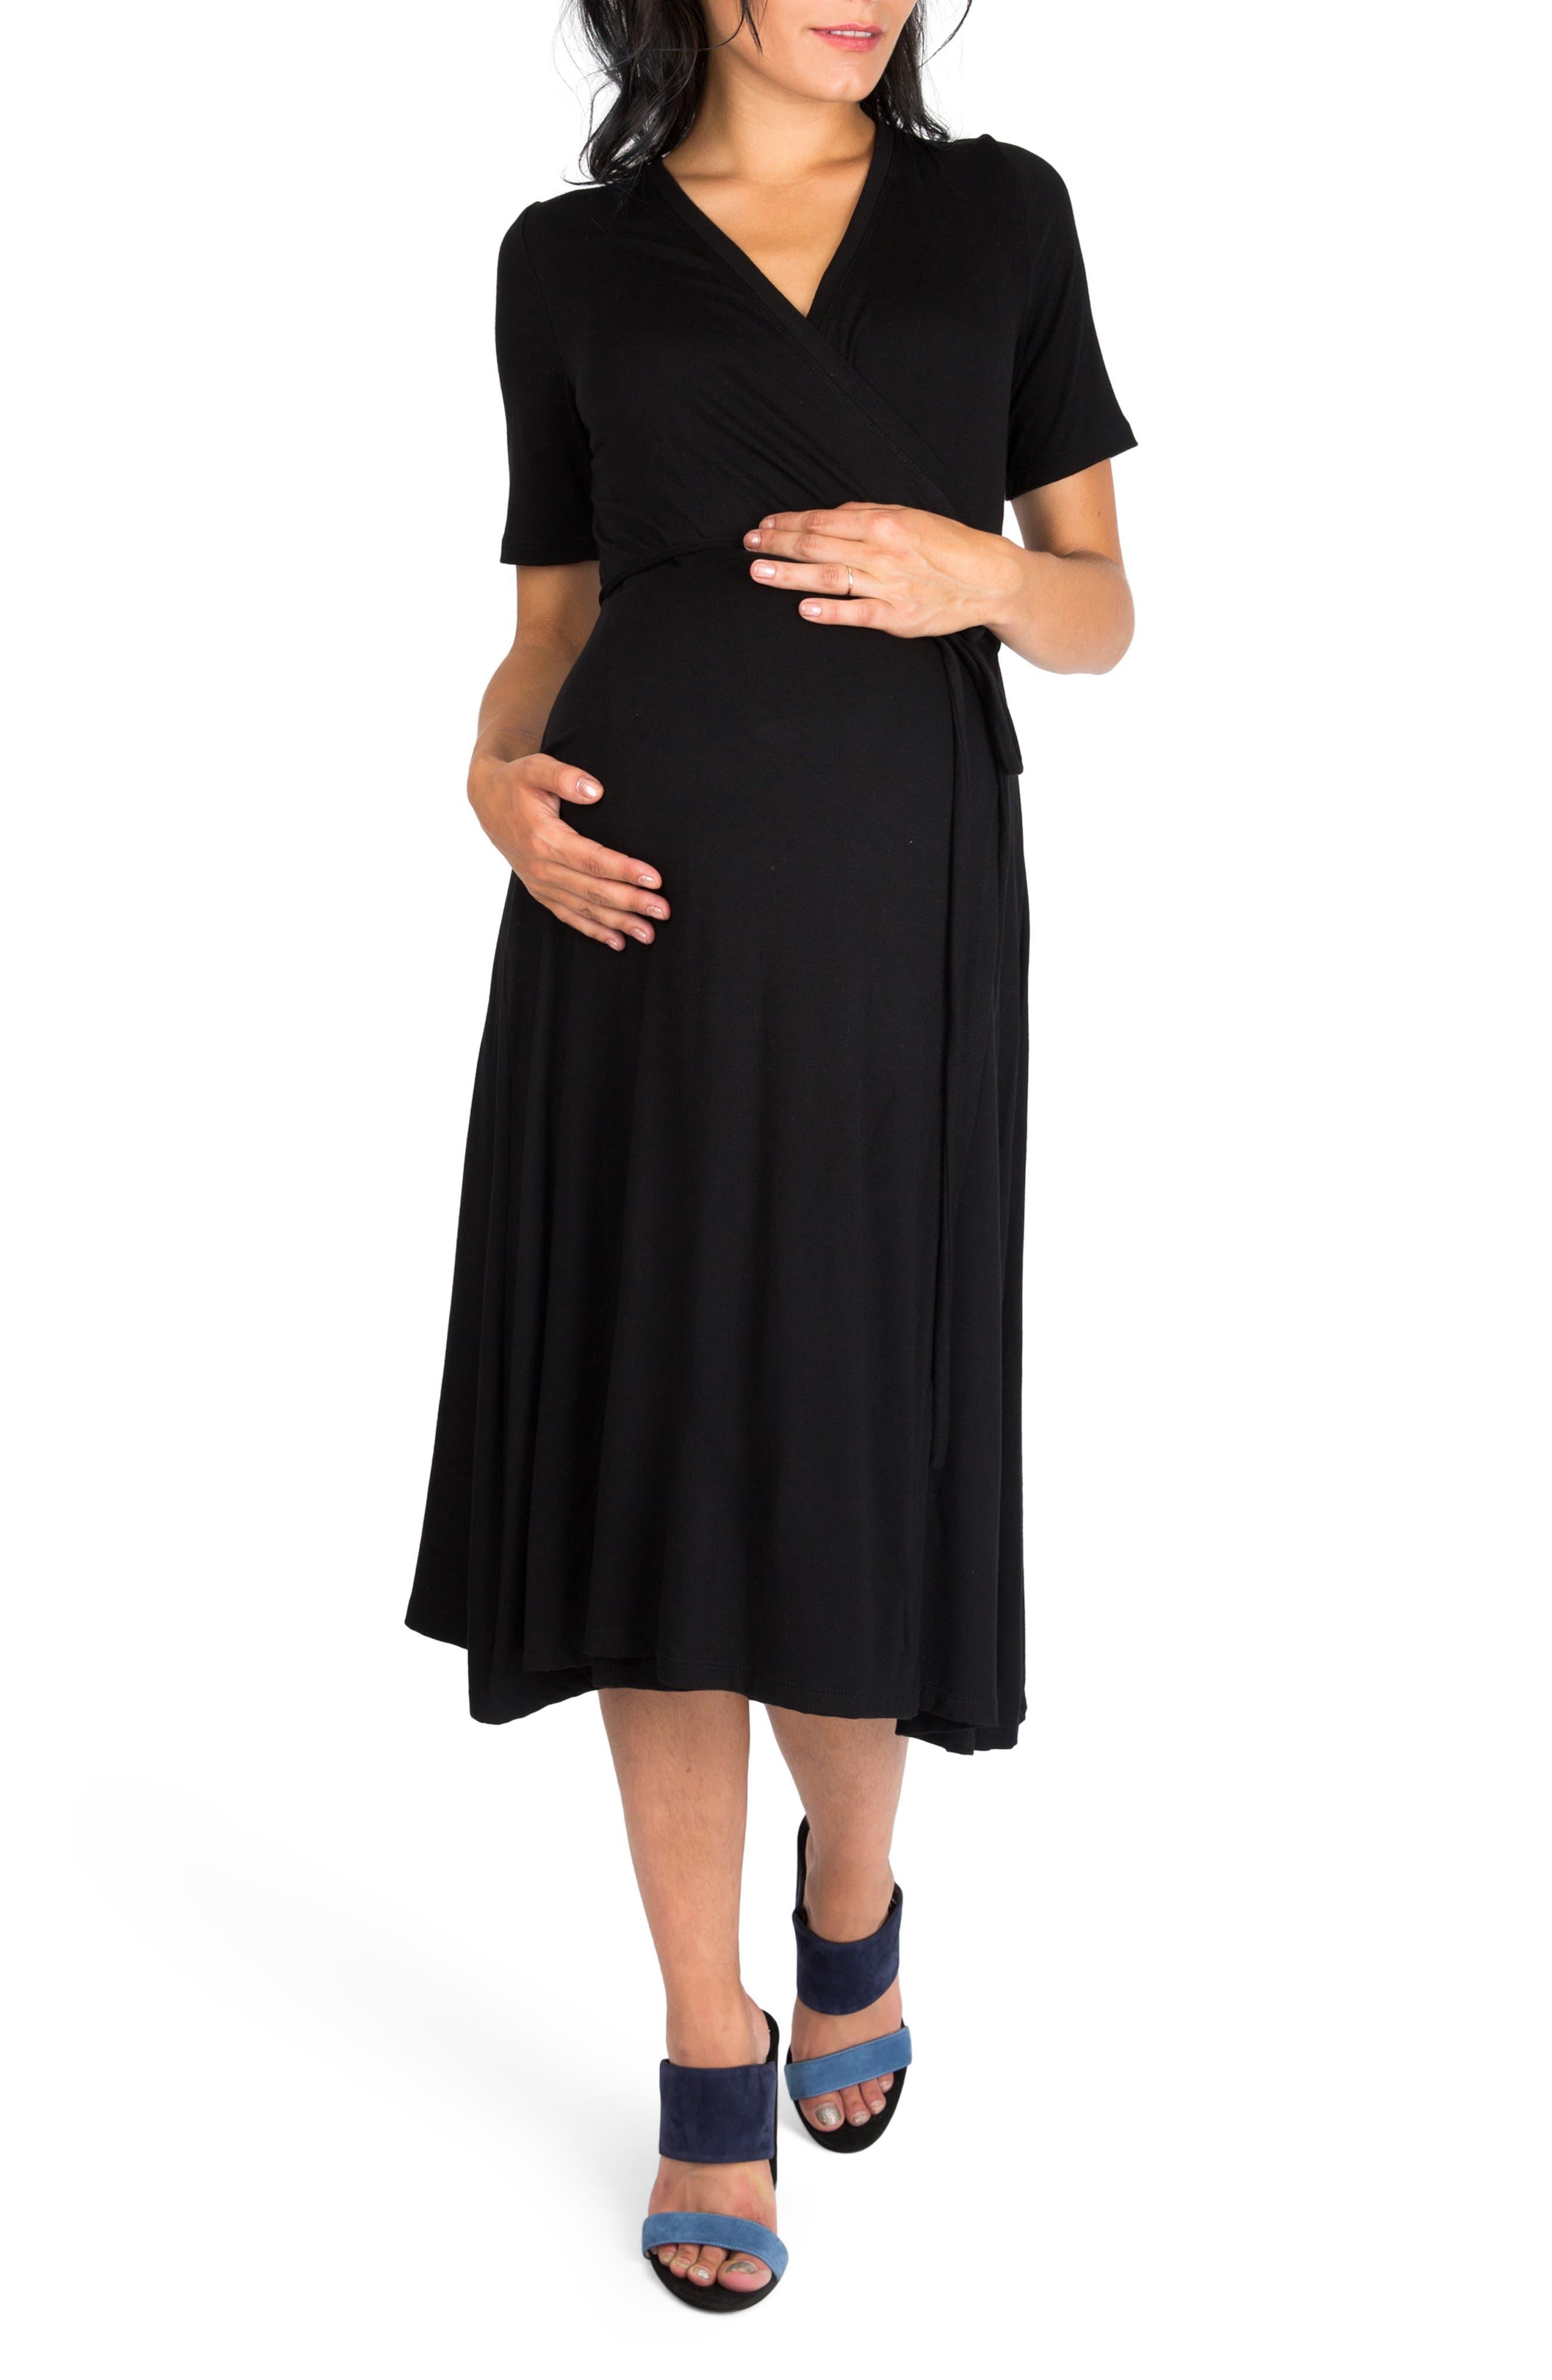 Nom Maternity Maya Wrap Maternity Dress, Black